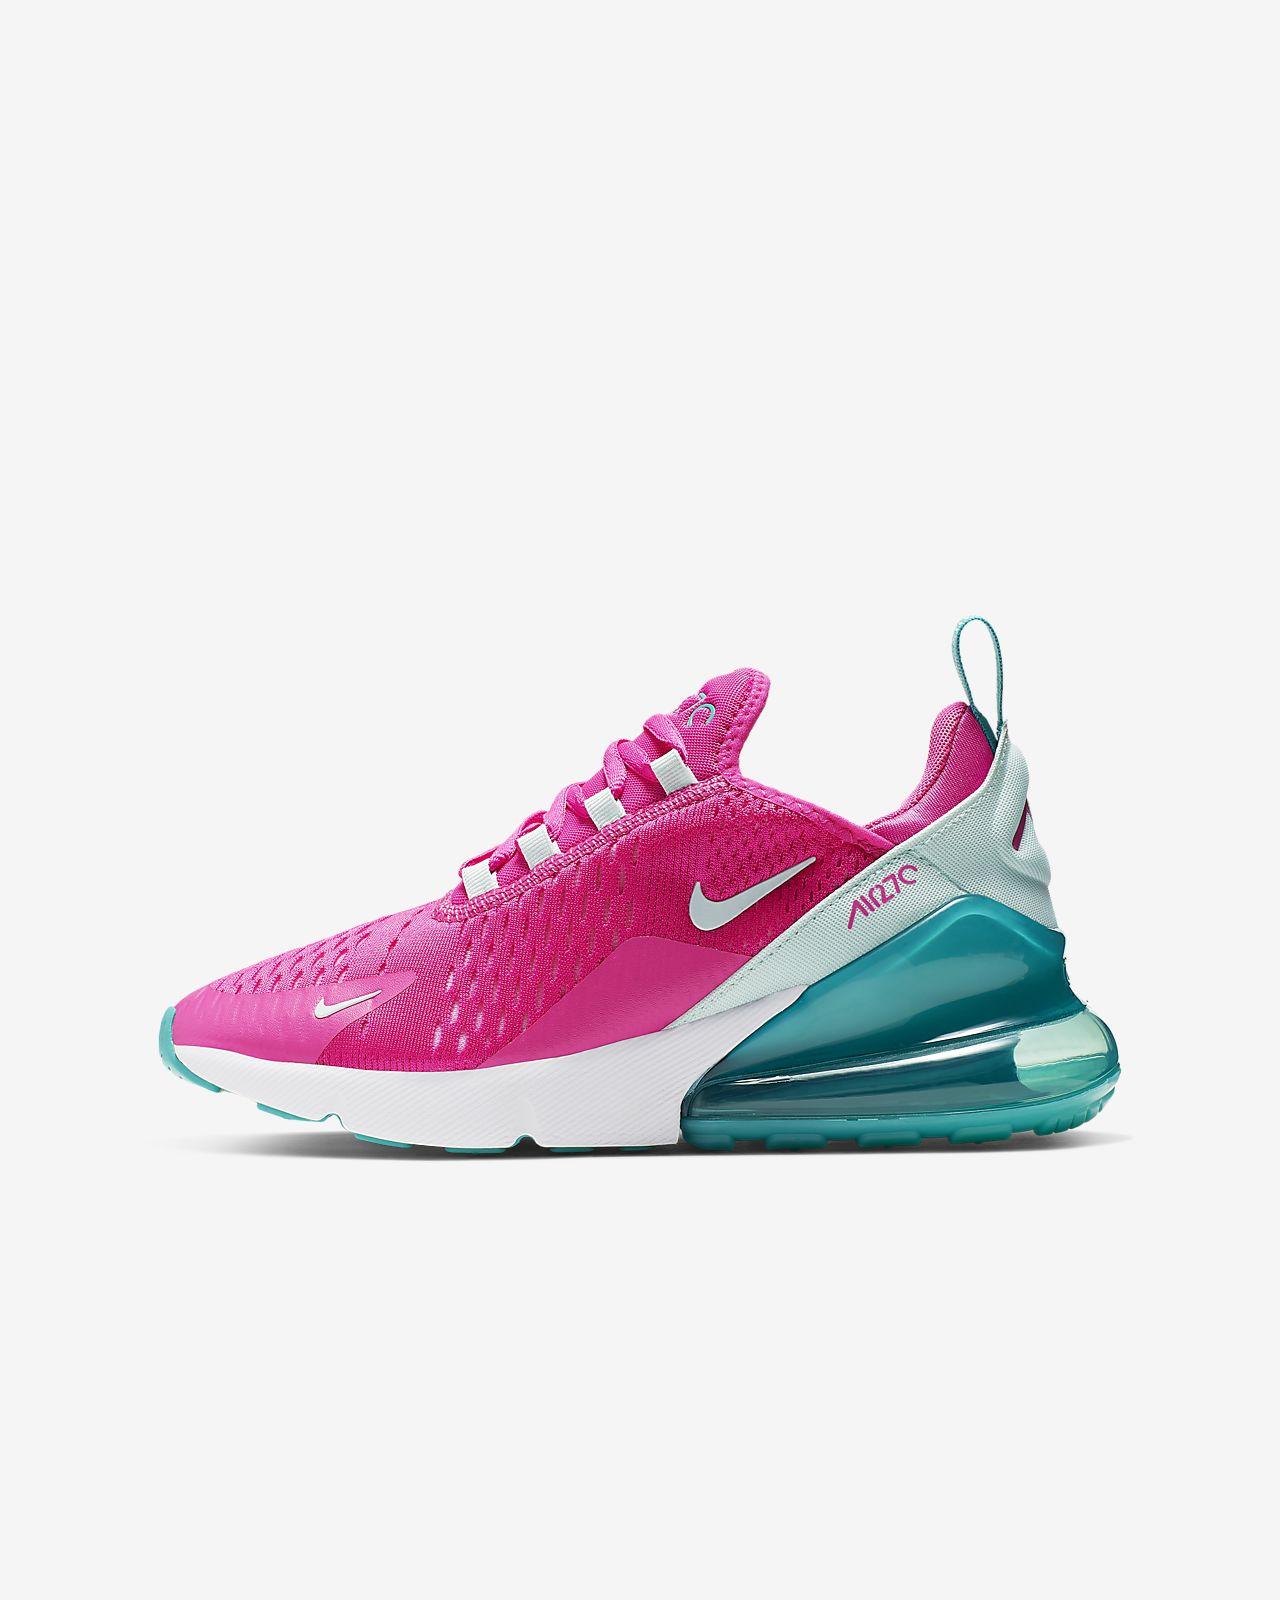 sports shoes f1fe2 09170 ... Nike Air Max 270 Big Kids  Shoe